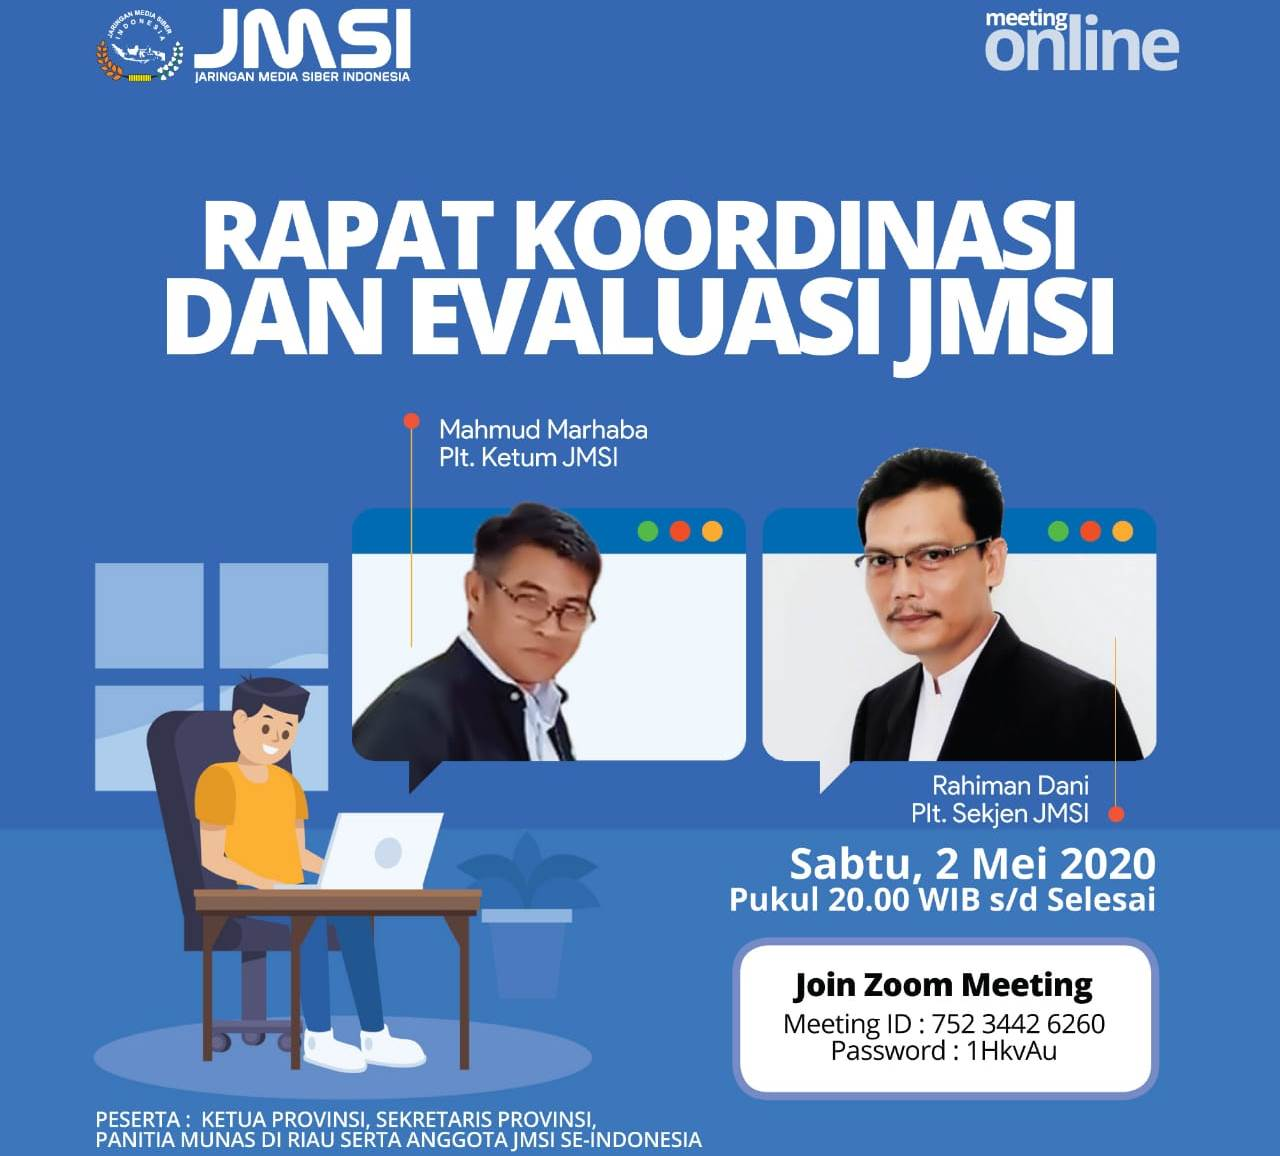 Rencana Munas JMSI, Pengurus Pusat Lakukan Rakorev